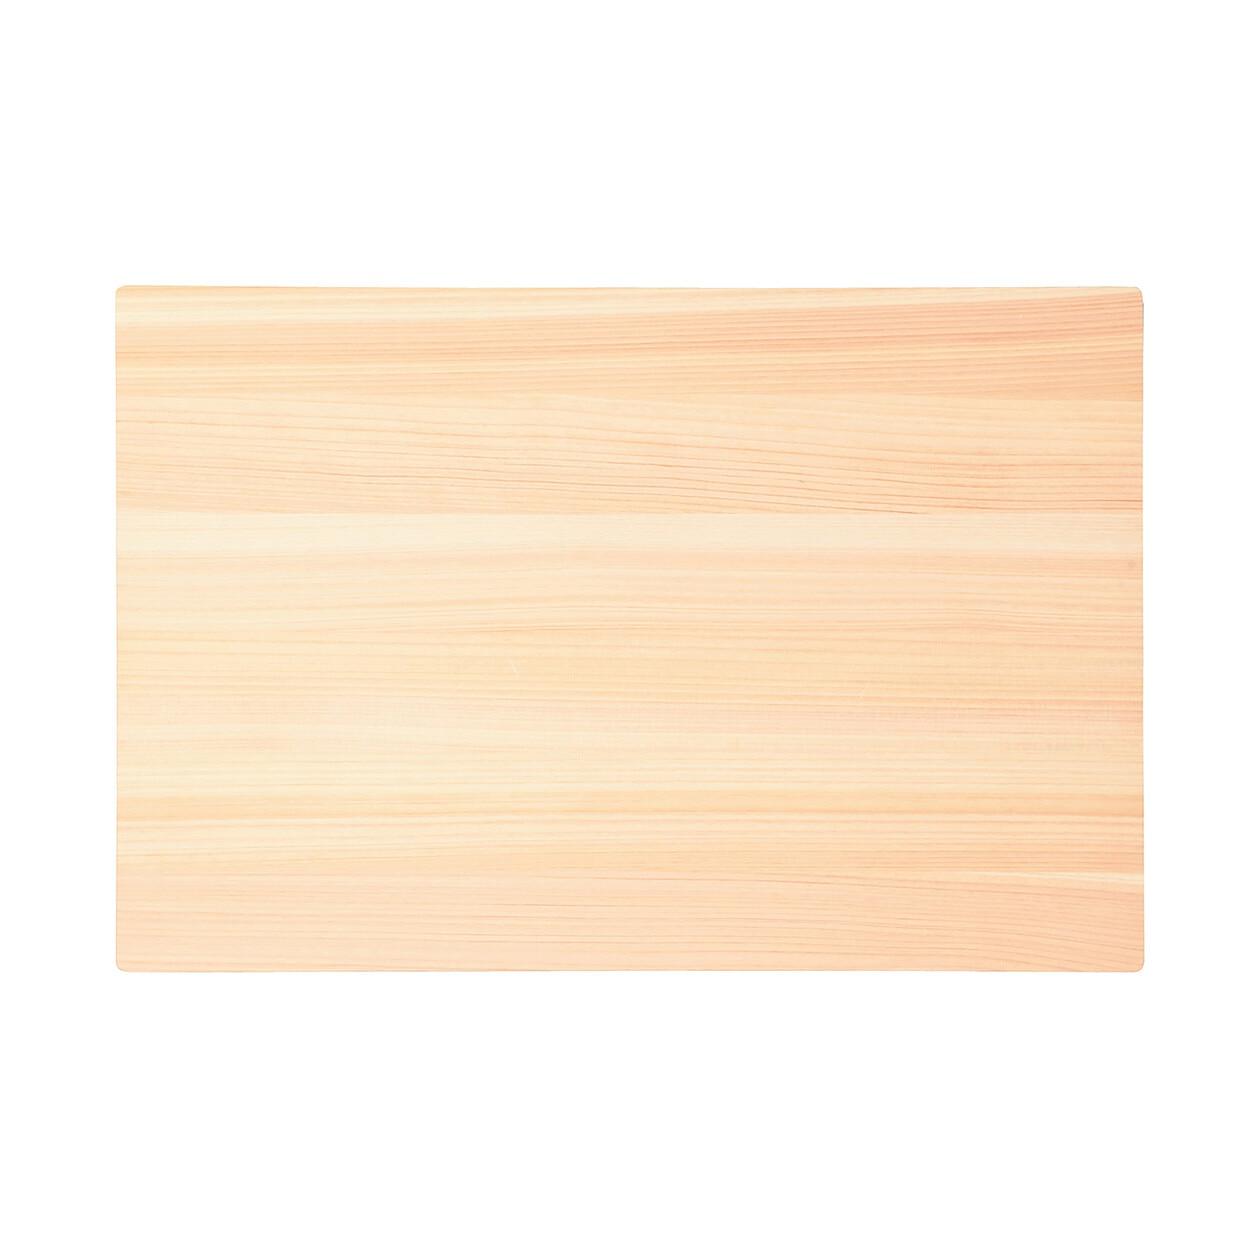 RoomClip商品情報 - ひのき調理板・薄型・大